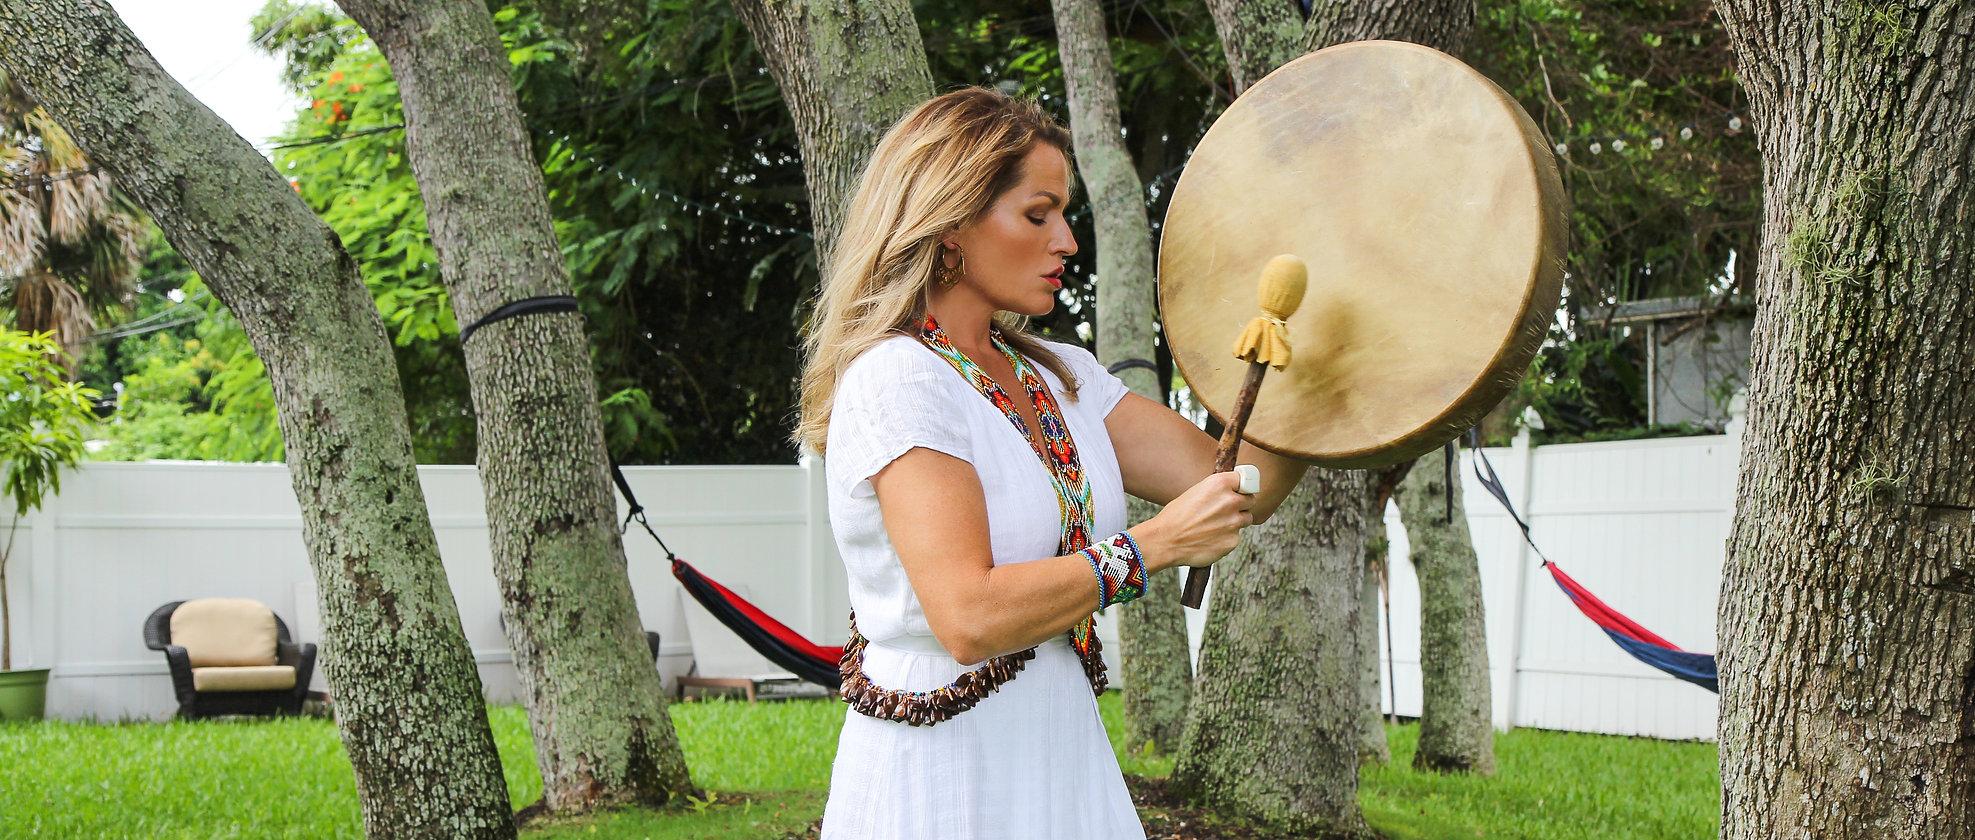 Drum side white dress.jpg